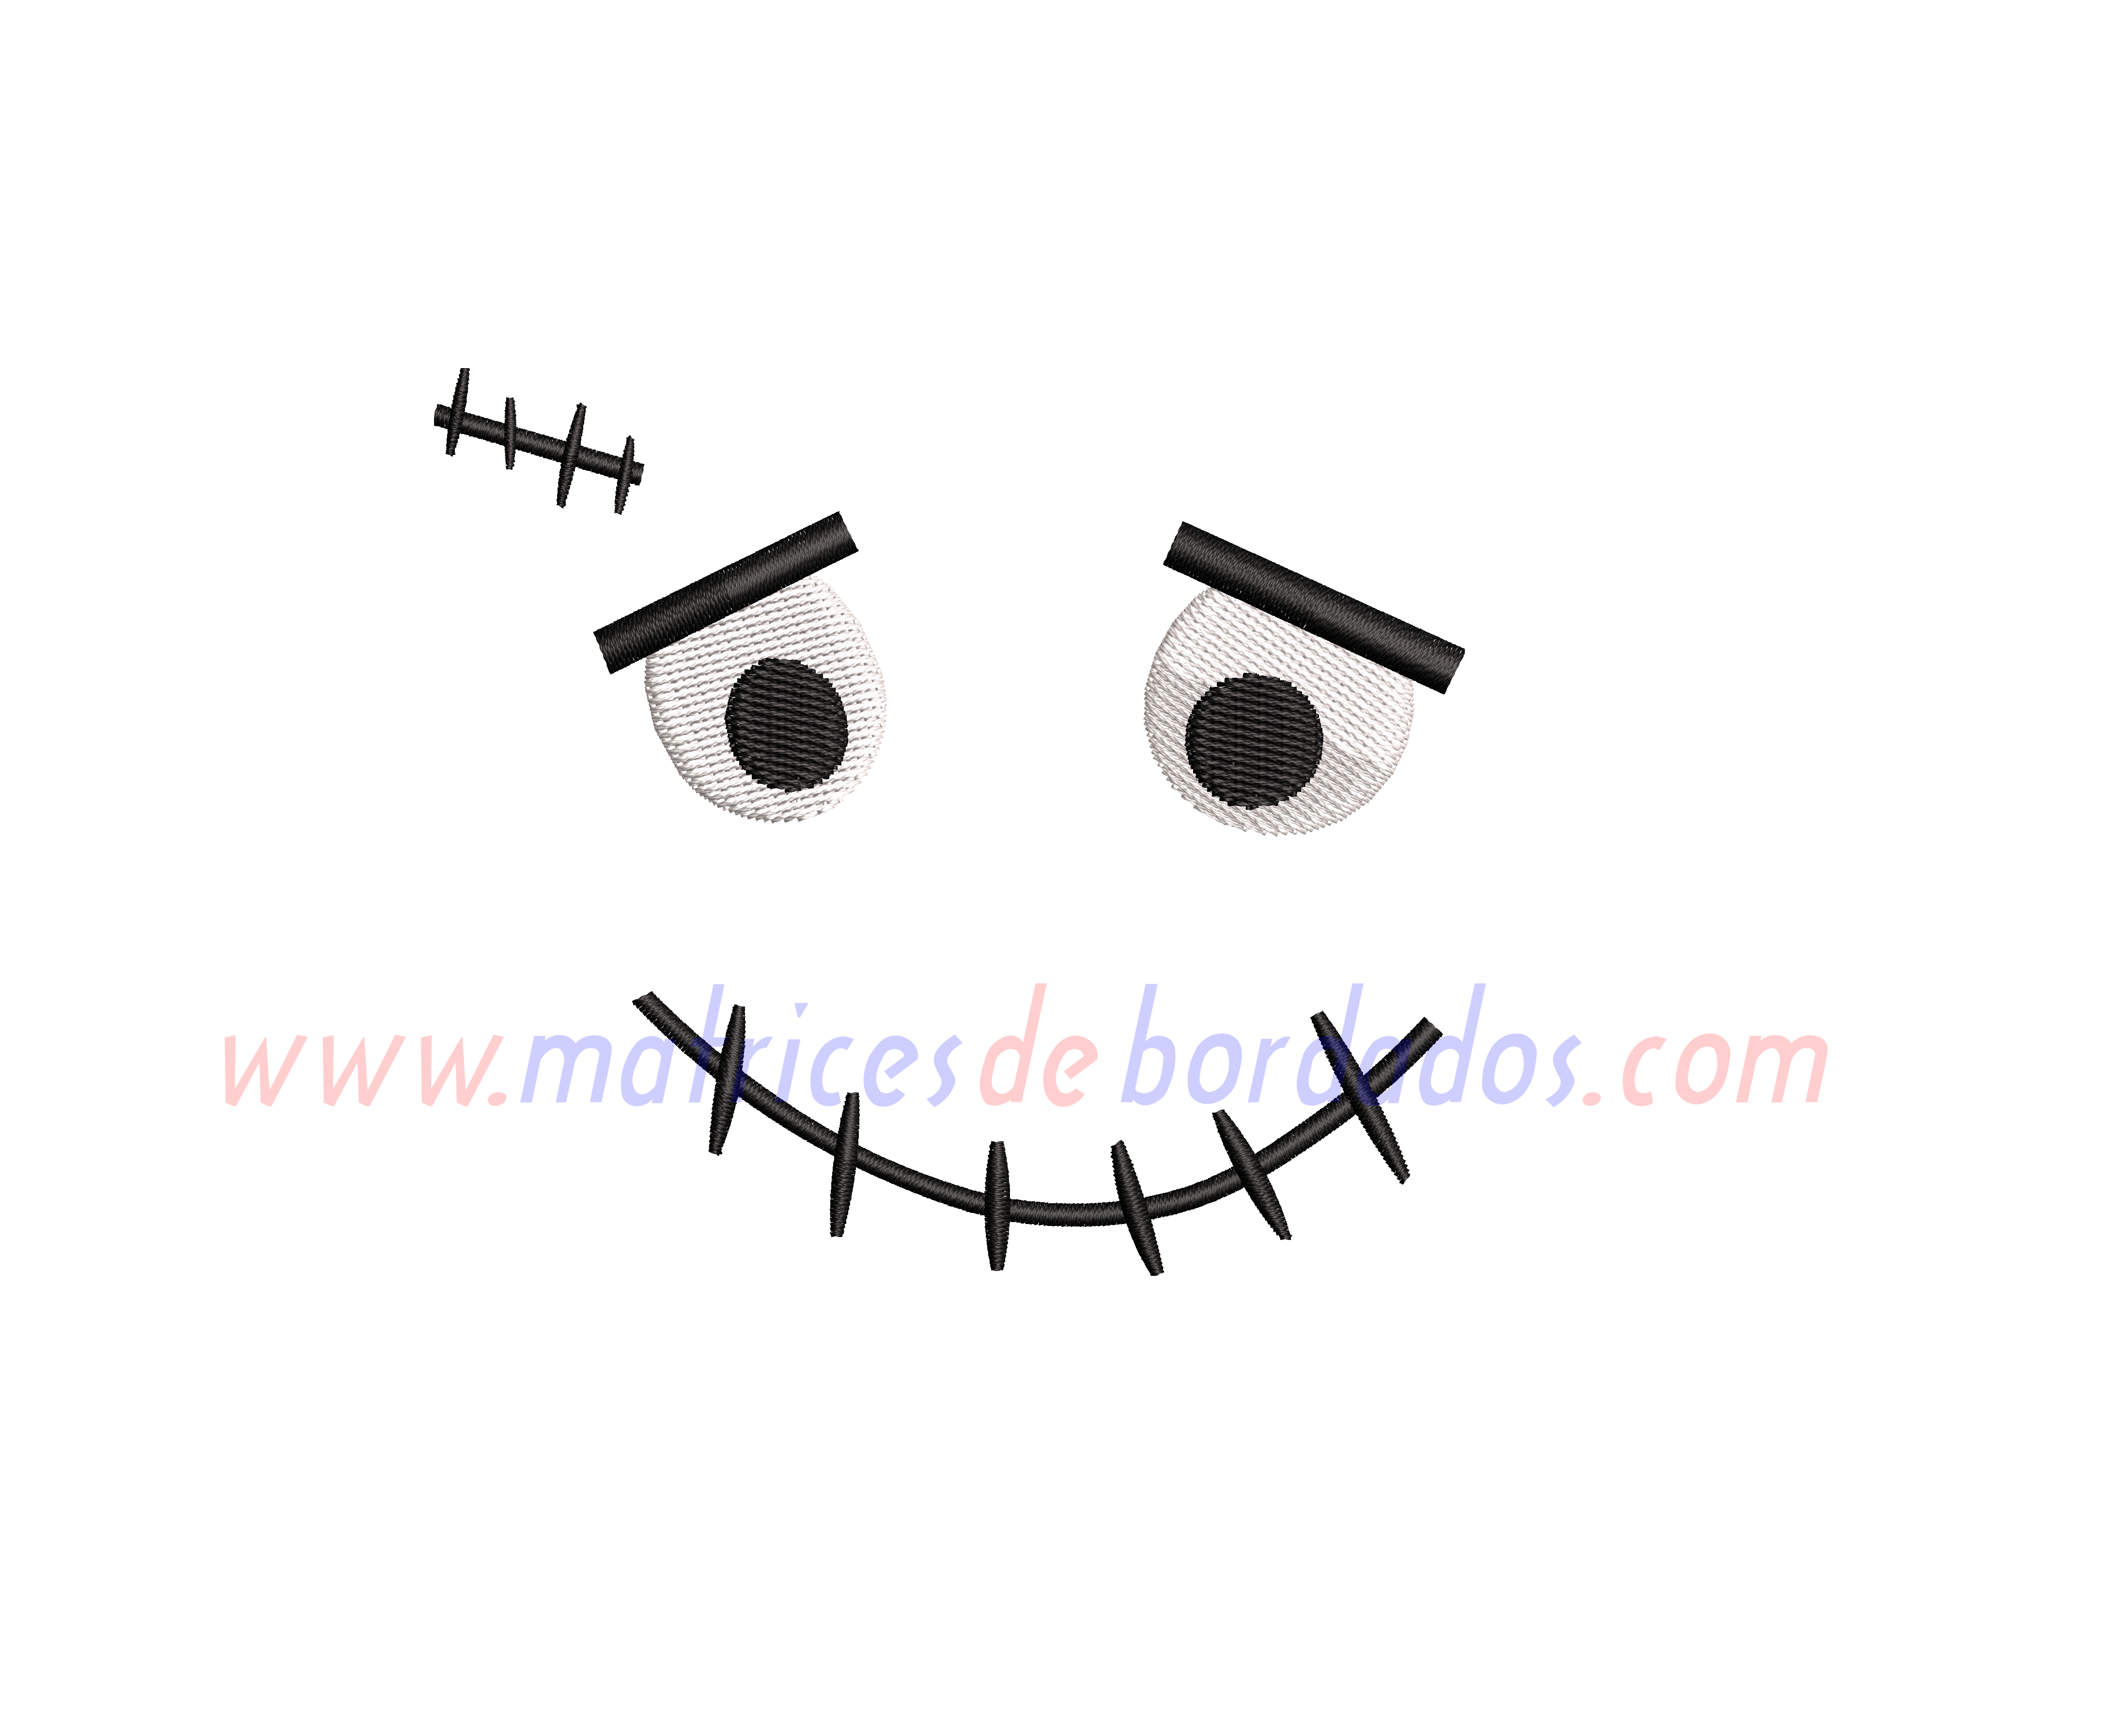 YL13BD - Cara de monstruo Franskenstein Halloween